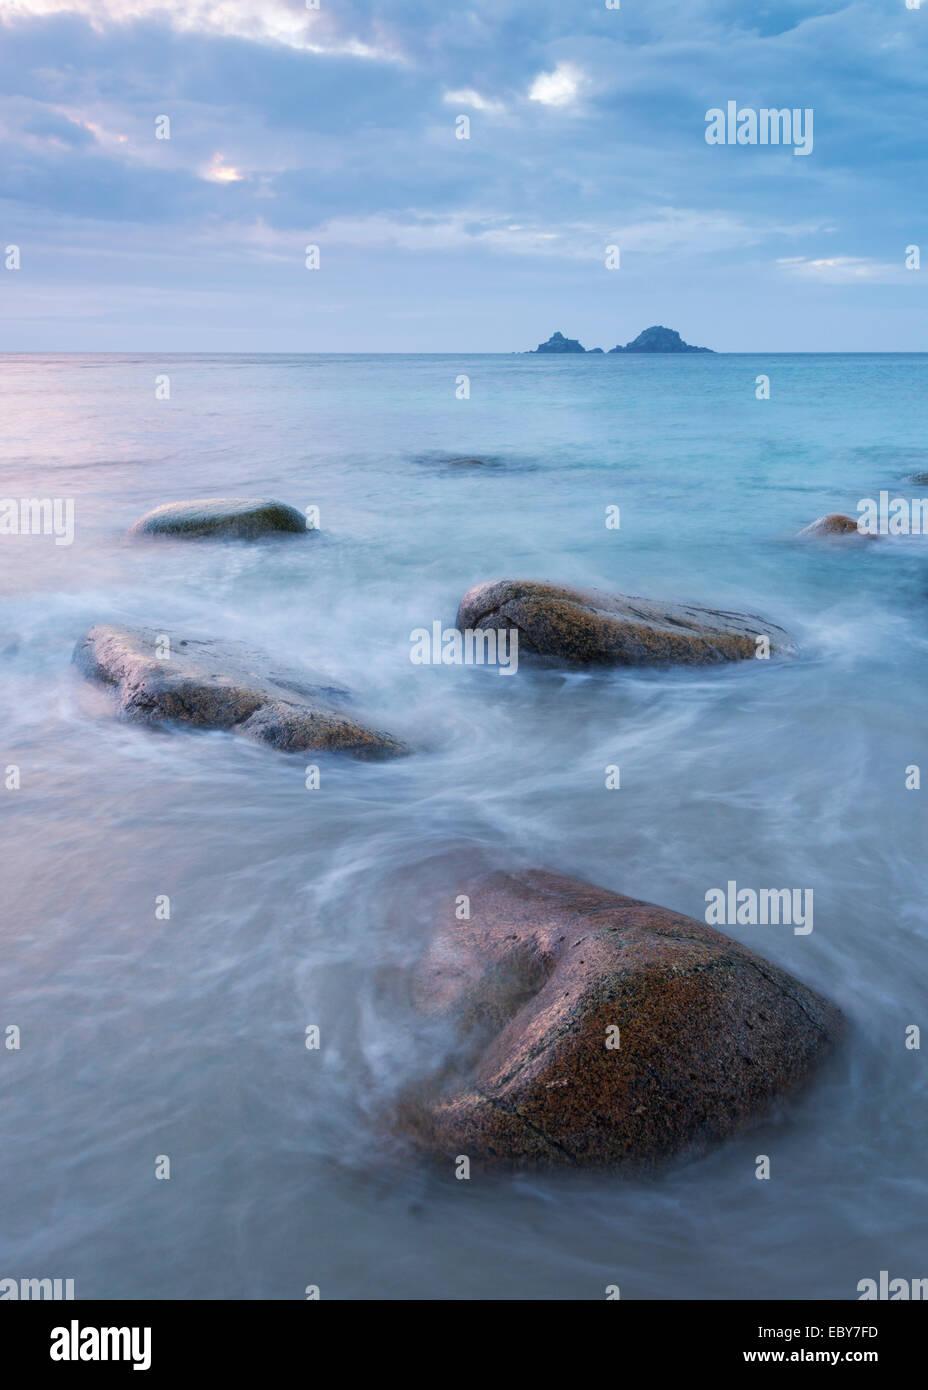 Cornish seascape, Porth Nanven, Cornwall, England. Autum (September) 2013. - Stock Image